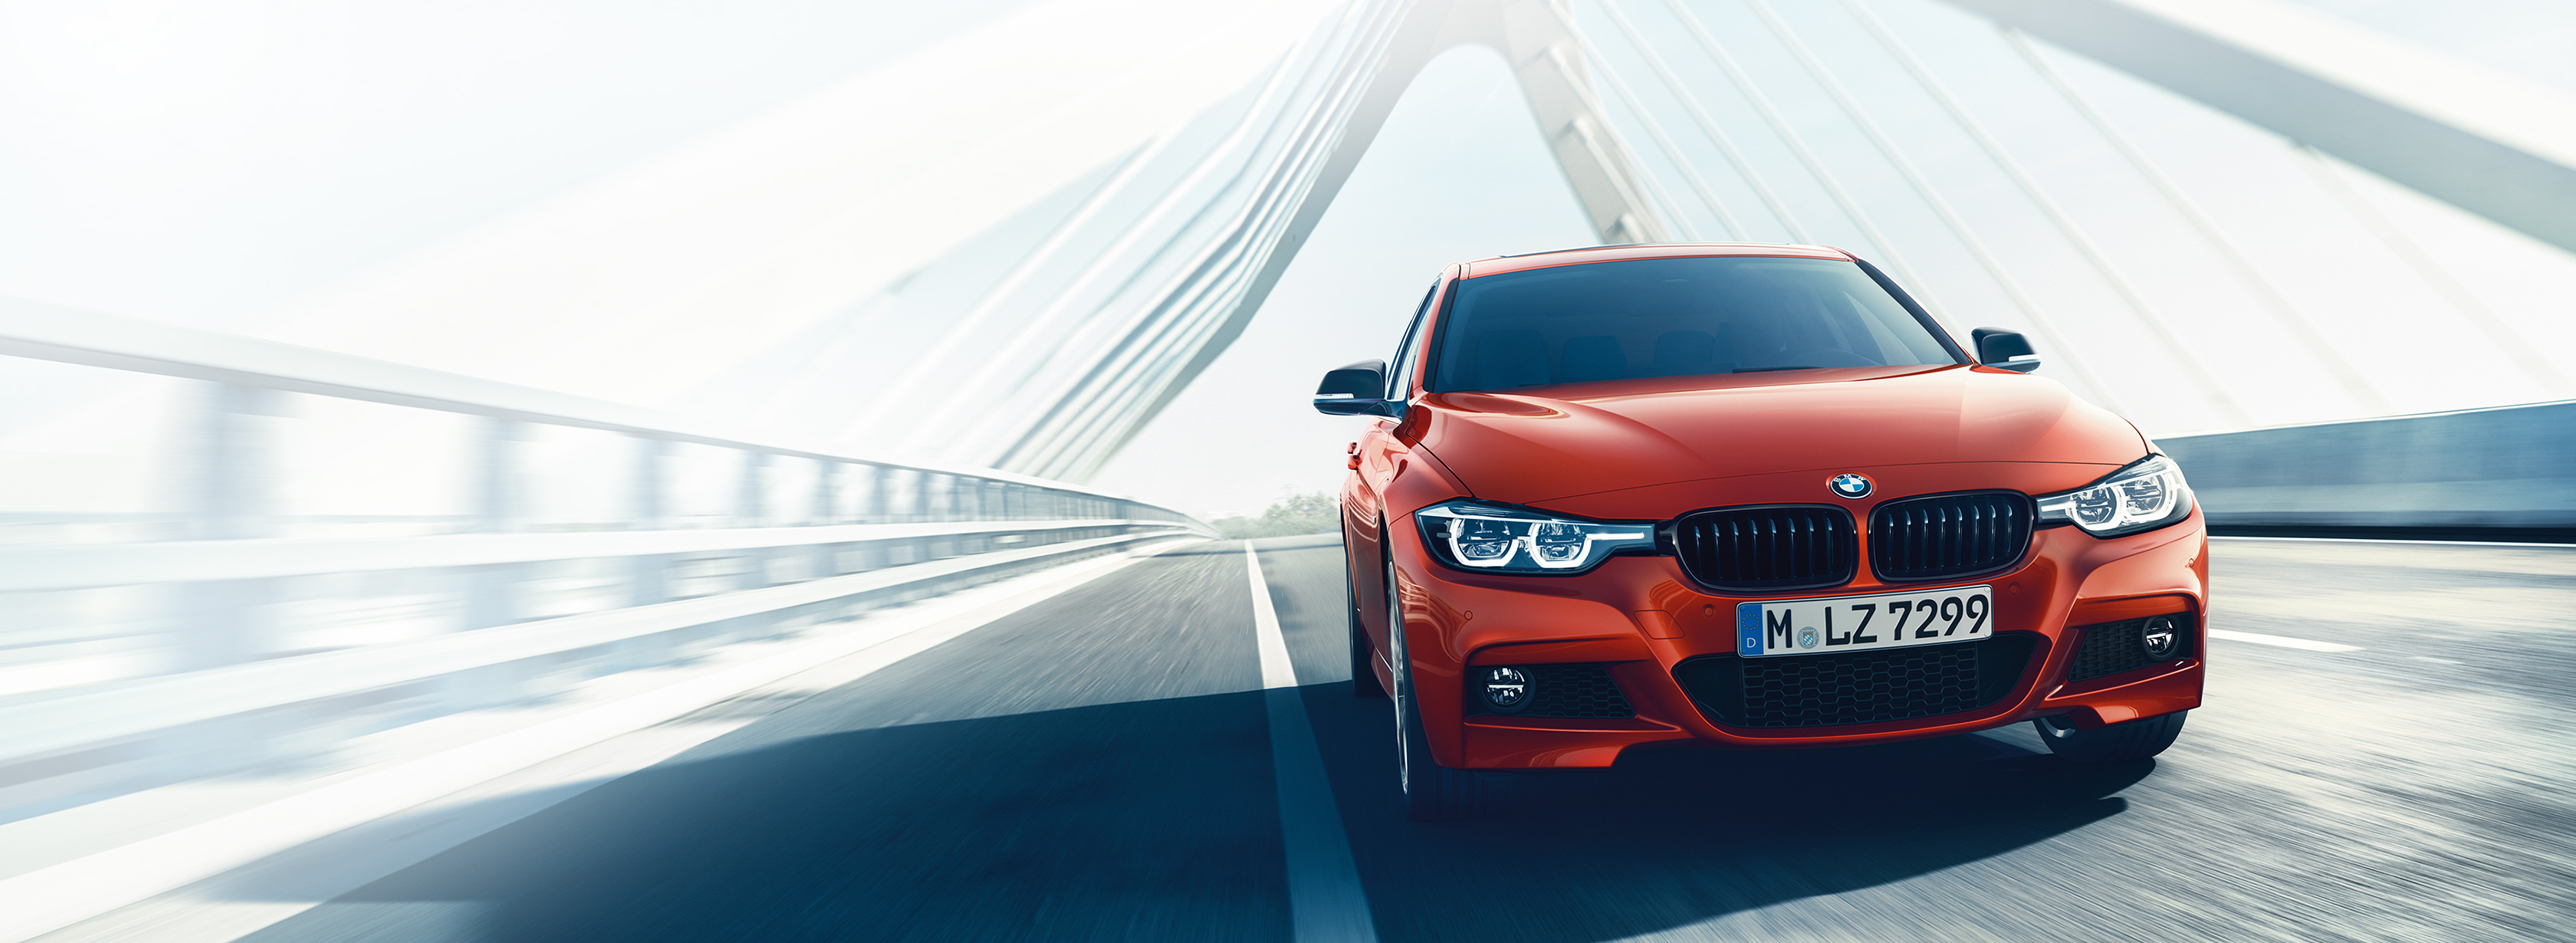 BMW Seria 3 Sedan editie limitata